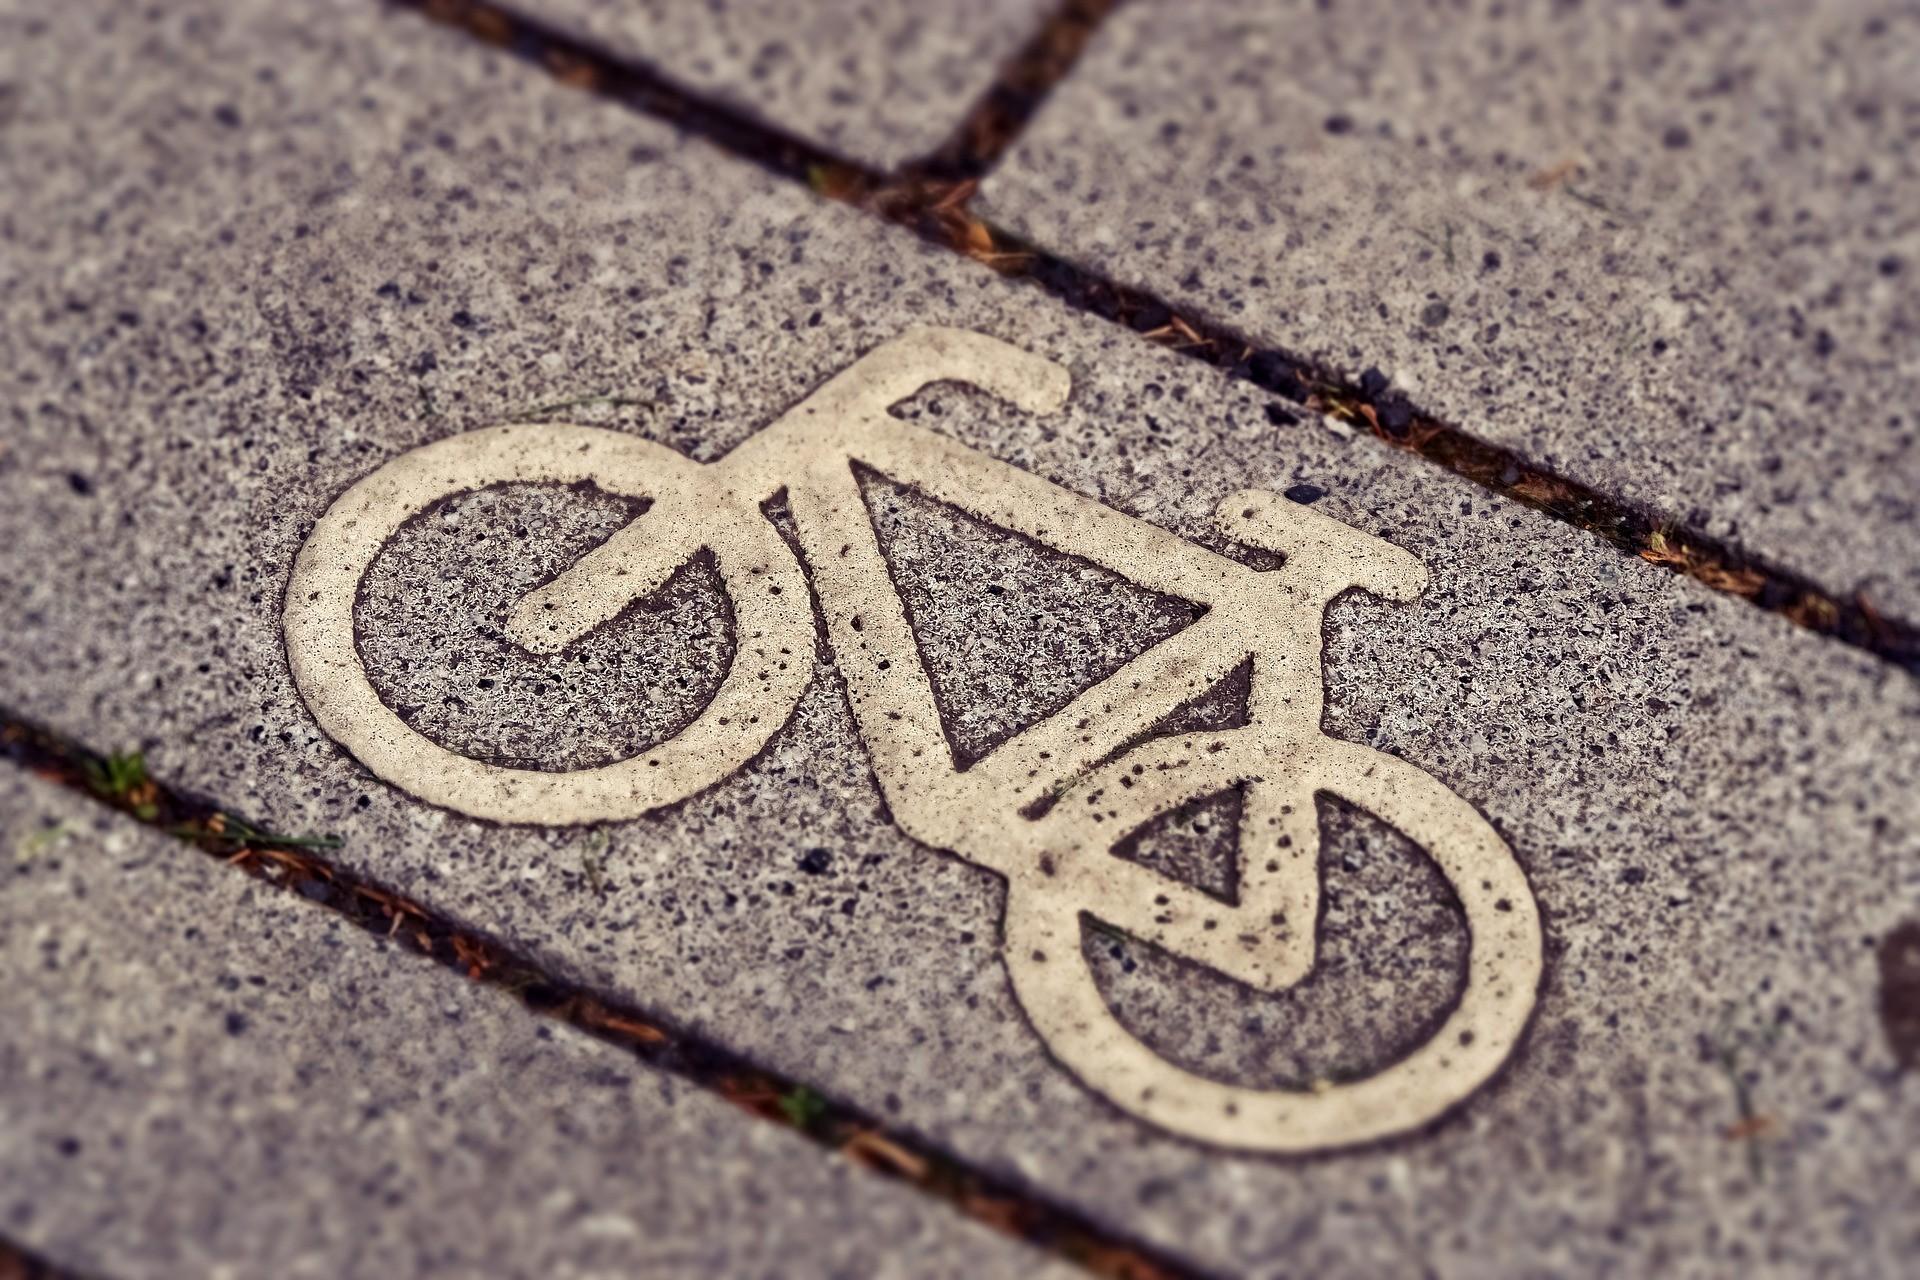 Fahrradspender gesucht